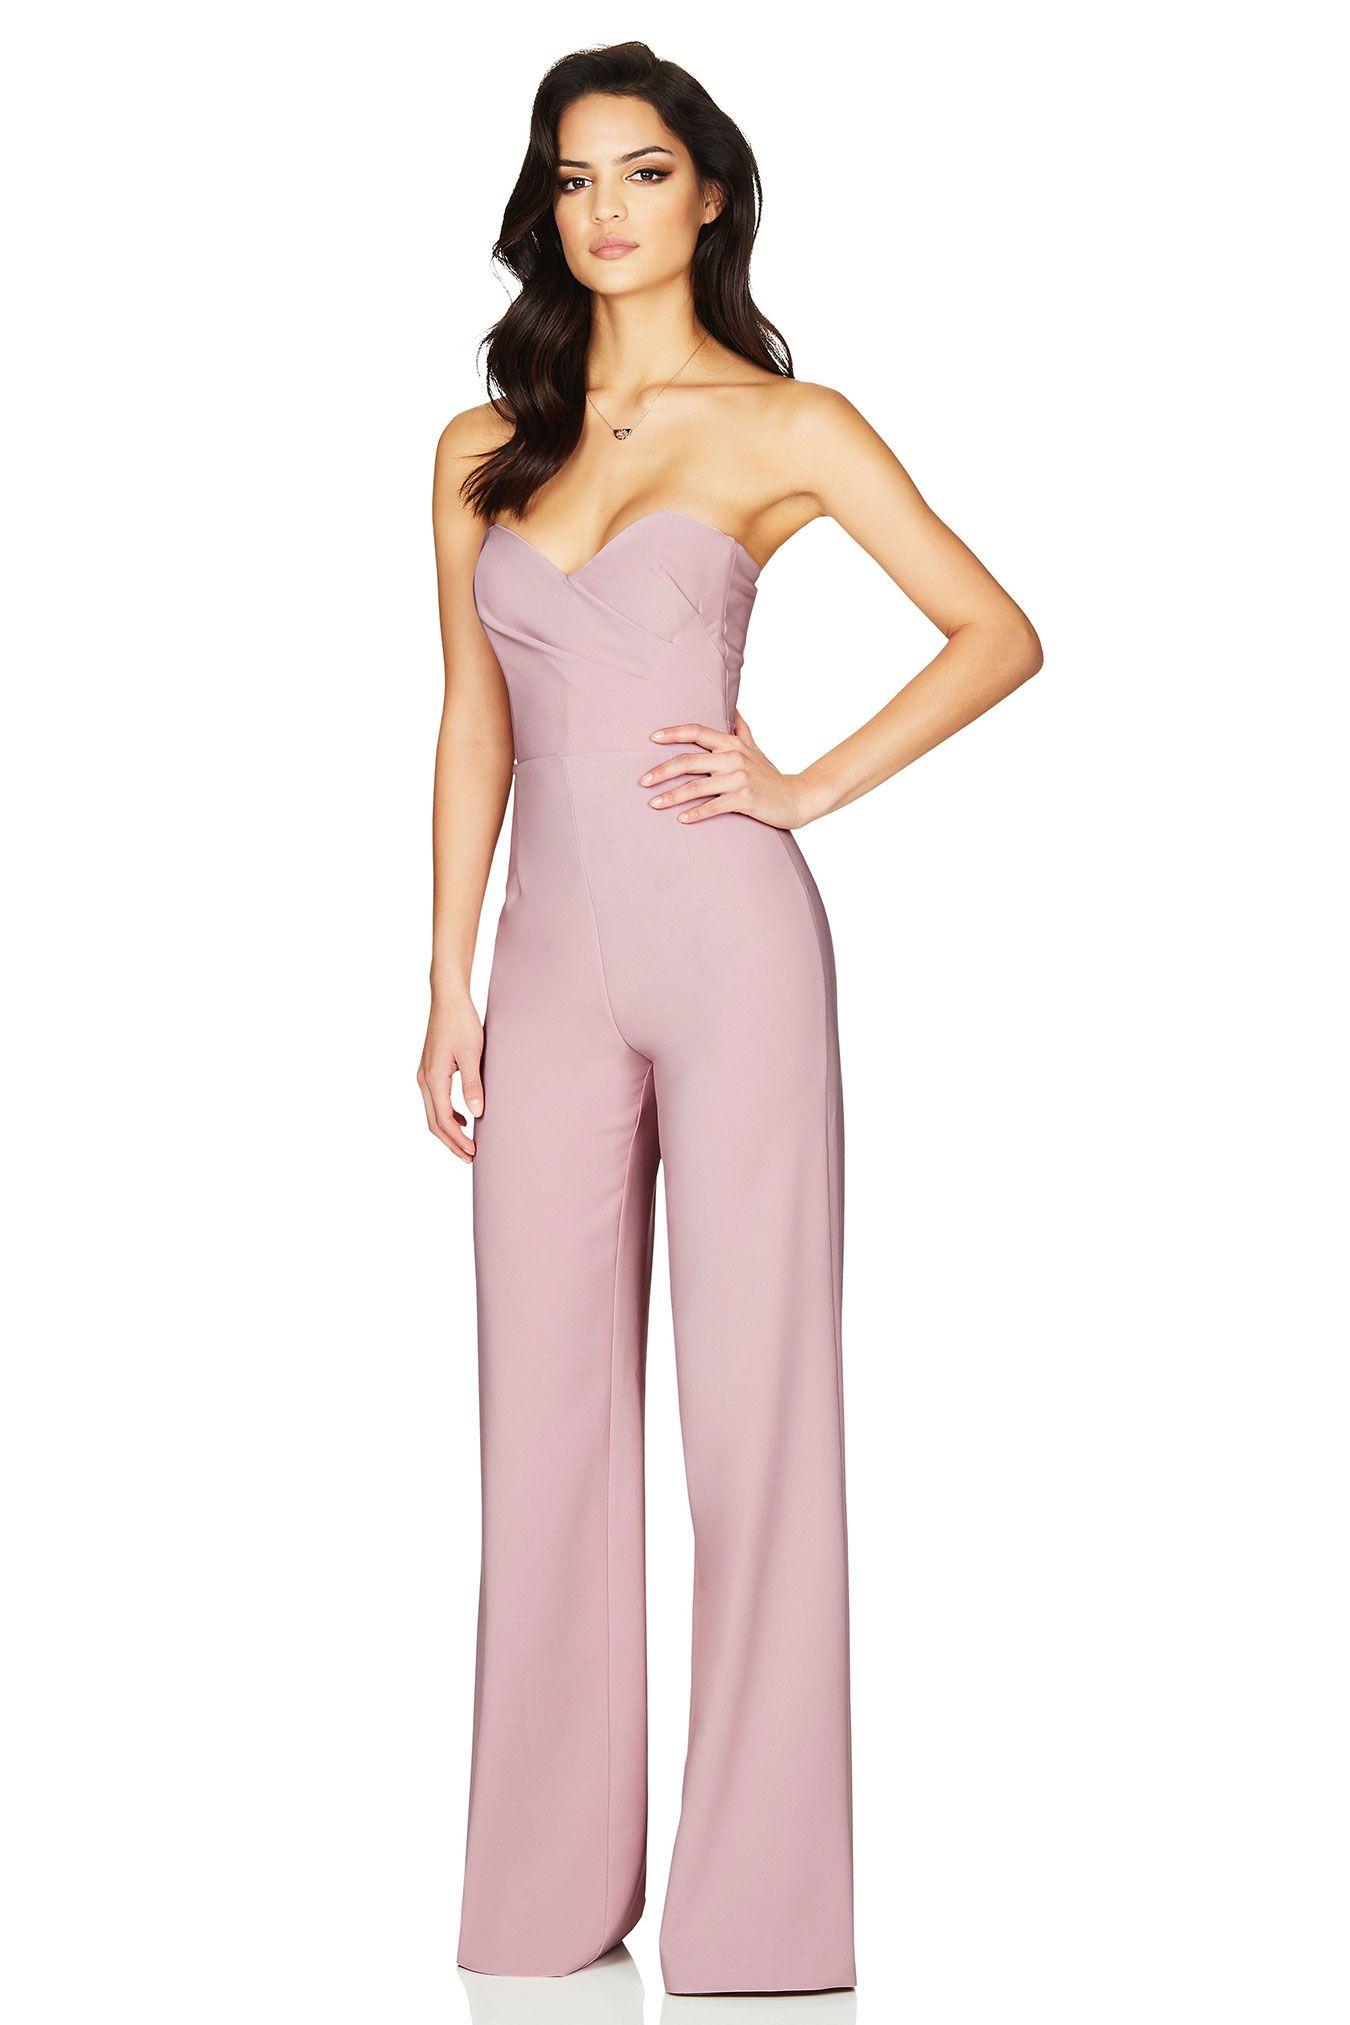 c67ac55c2907 BISOUS JUMPSUIT   Buy Designer Dresses Online at Nookie ...